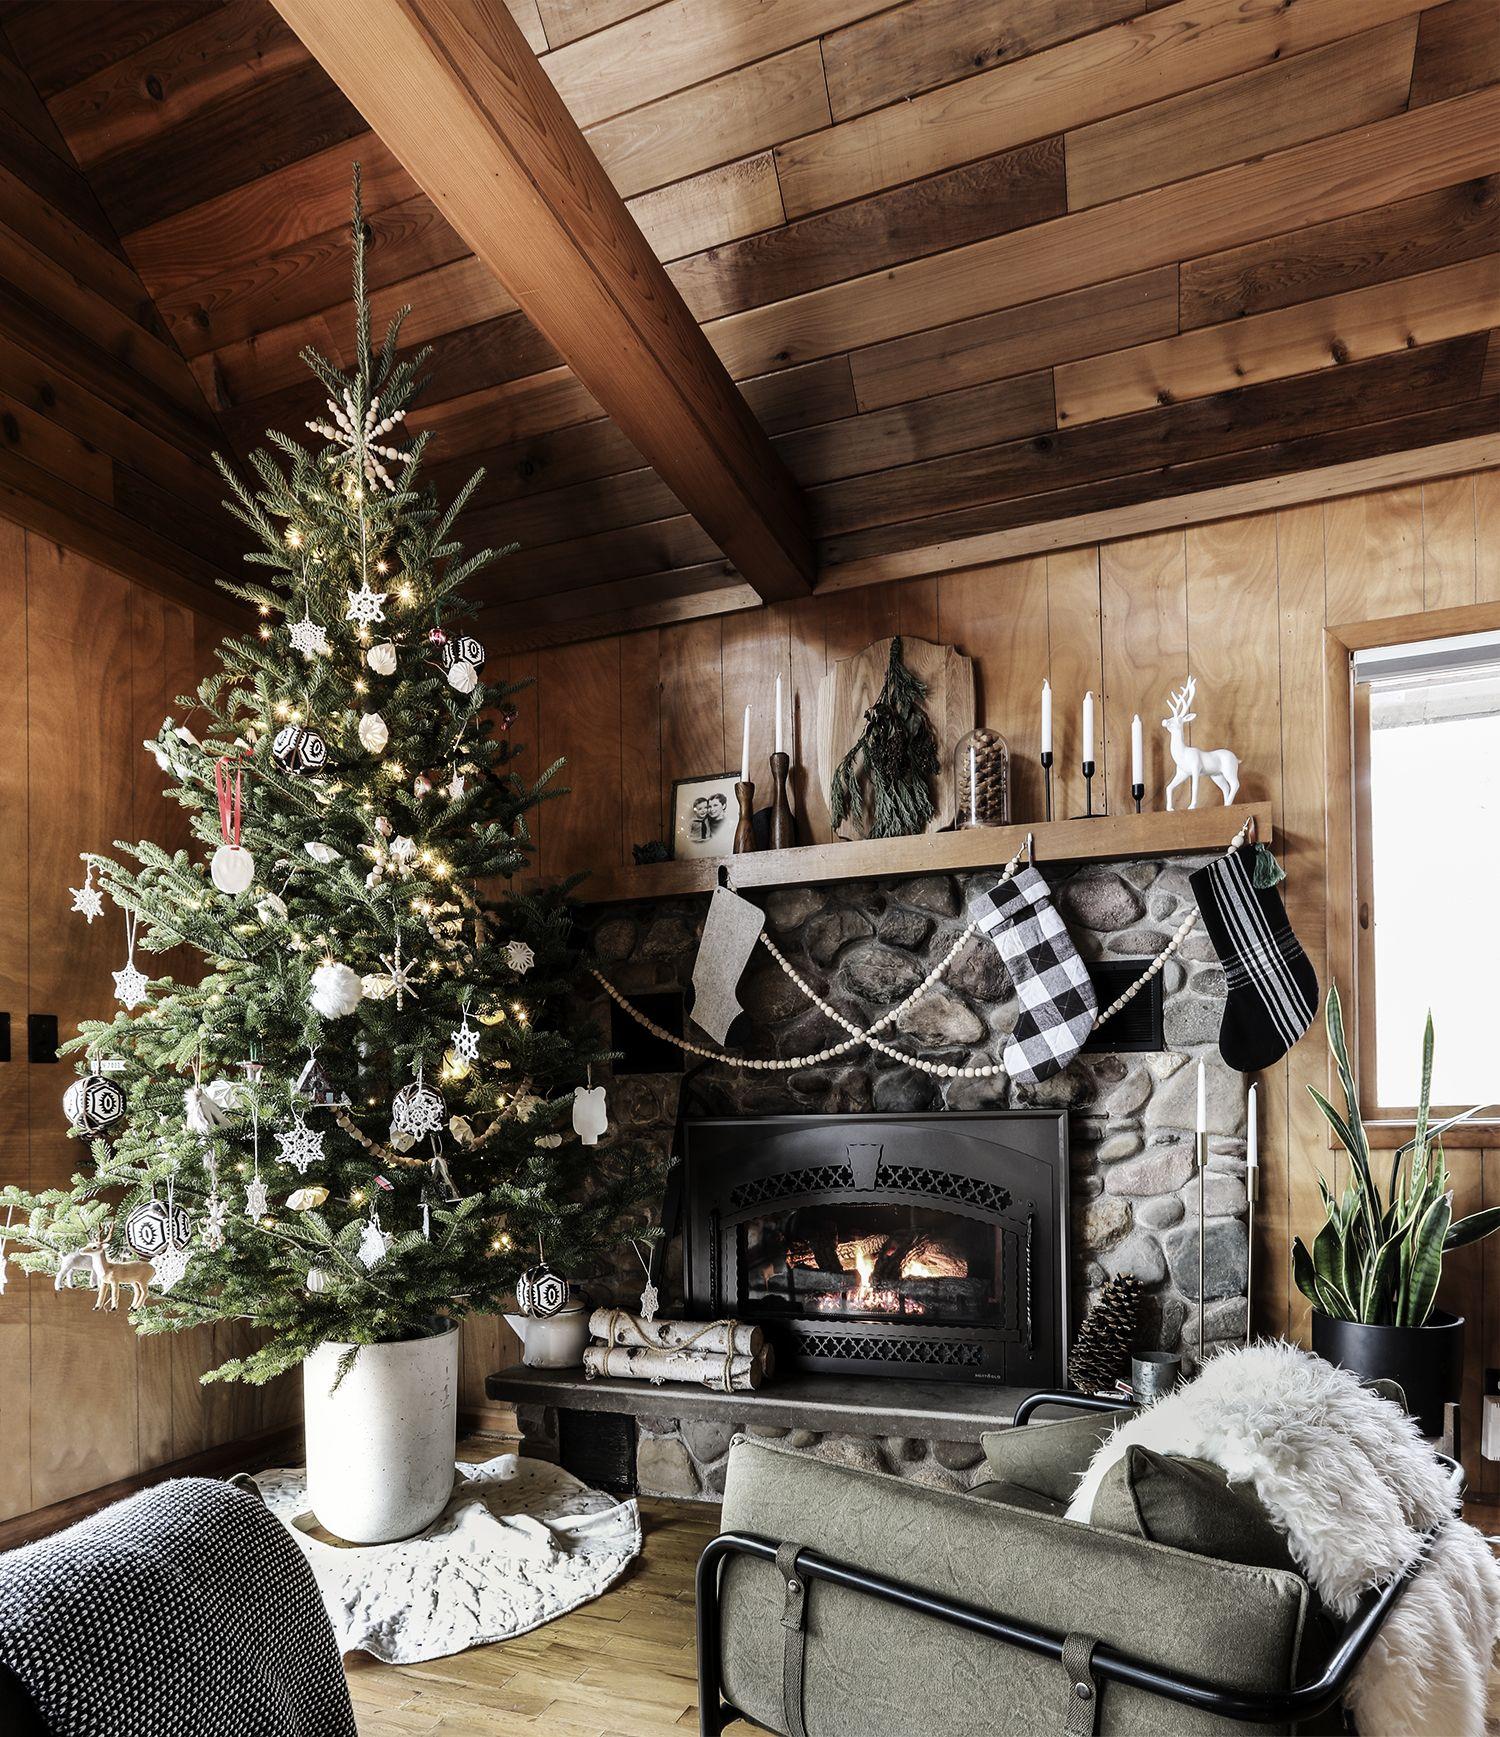 5e0c098f091cc3d06765ff979aab86d3 - Better Homes And Gardens A Wonderful Winter